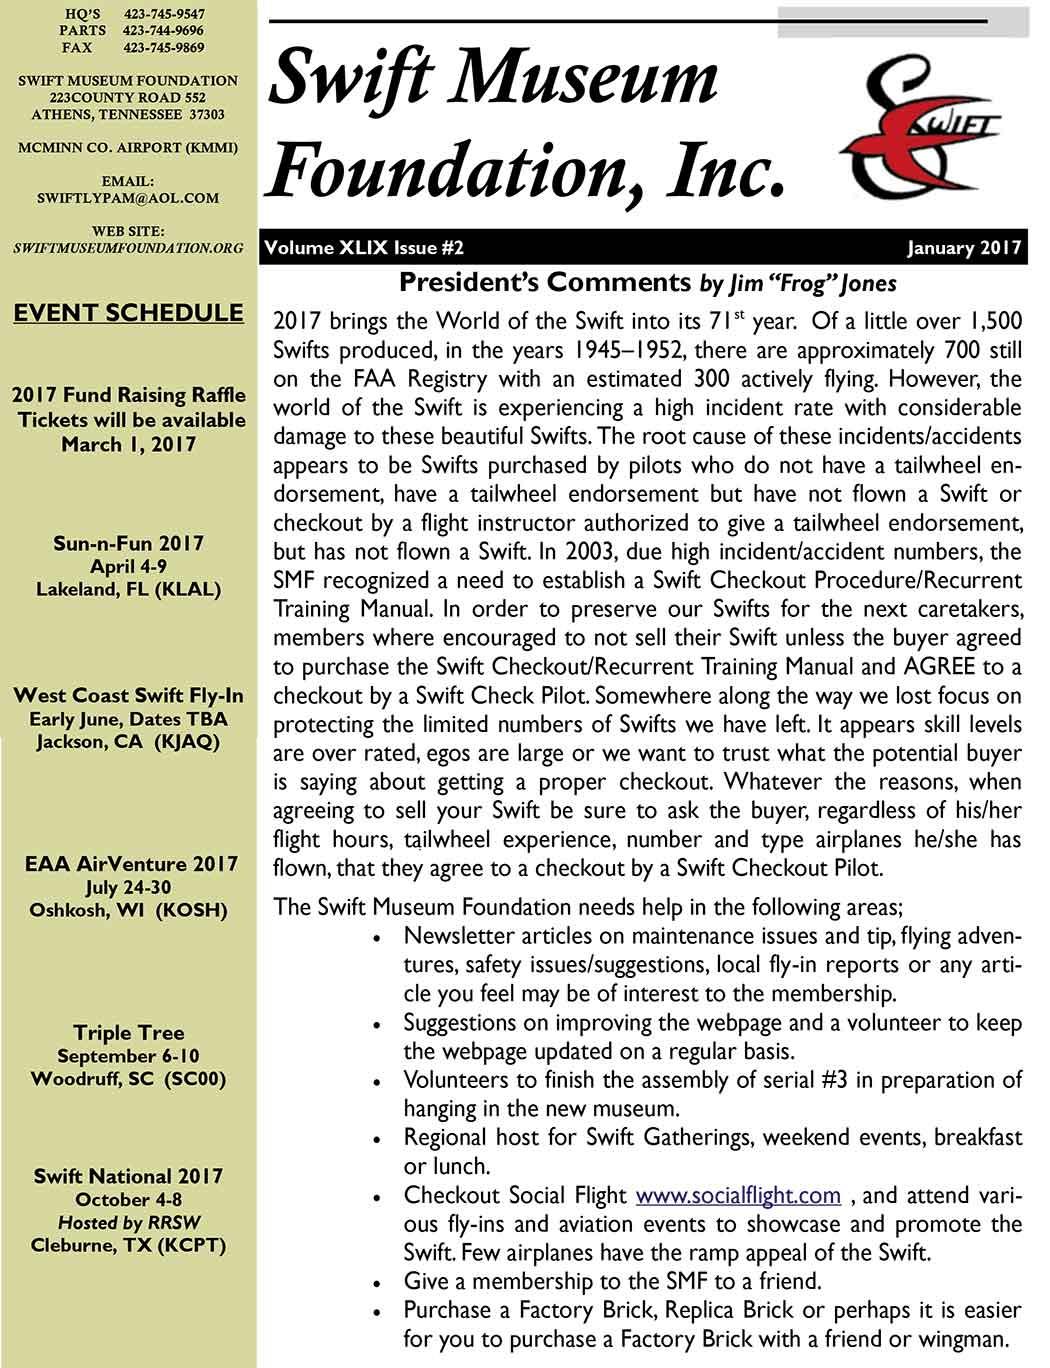 January 2017 Newsletter - Swift Museum Foundation, Inc